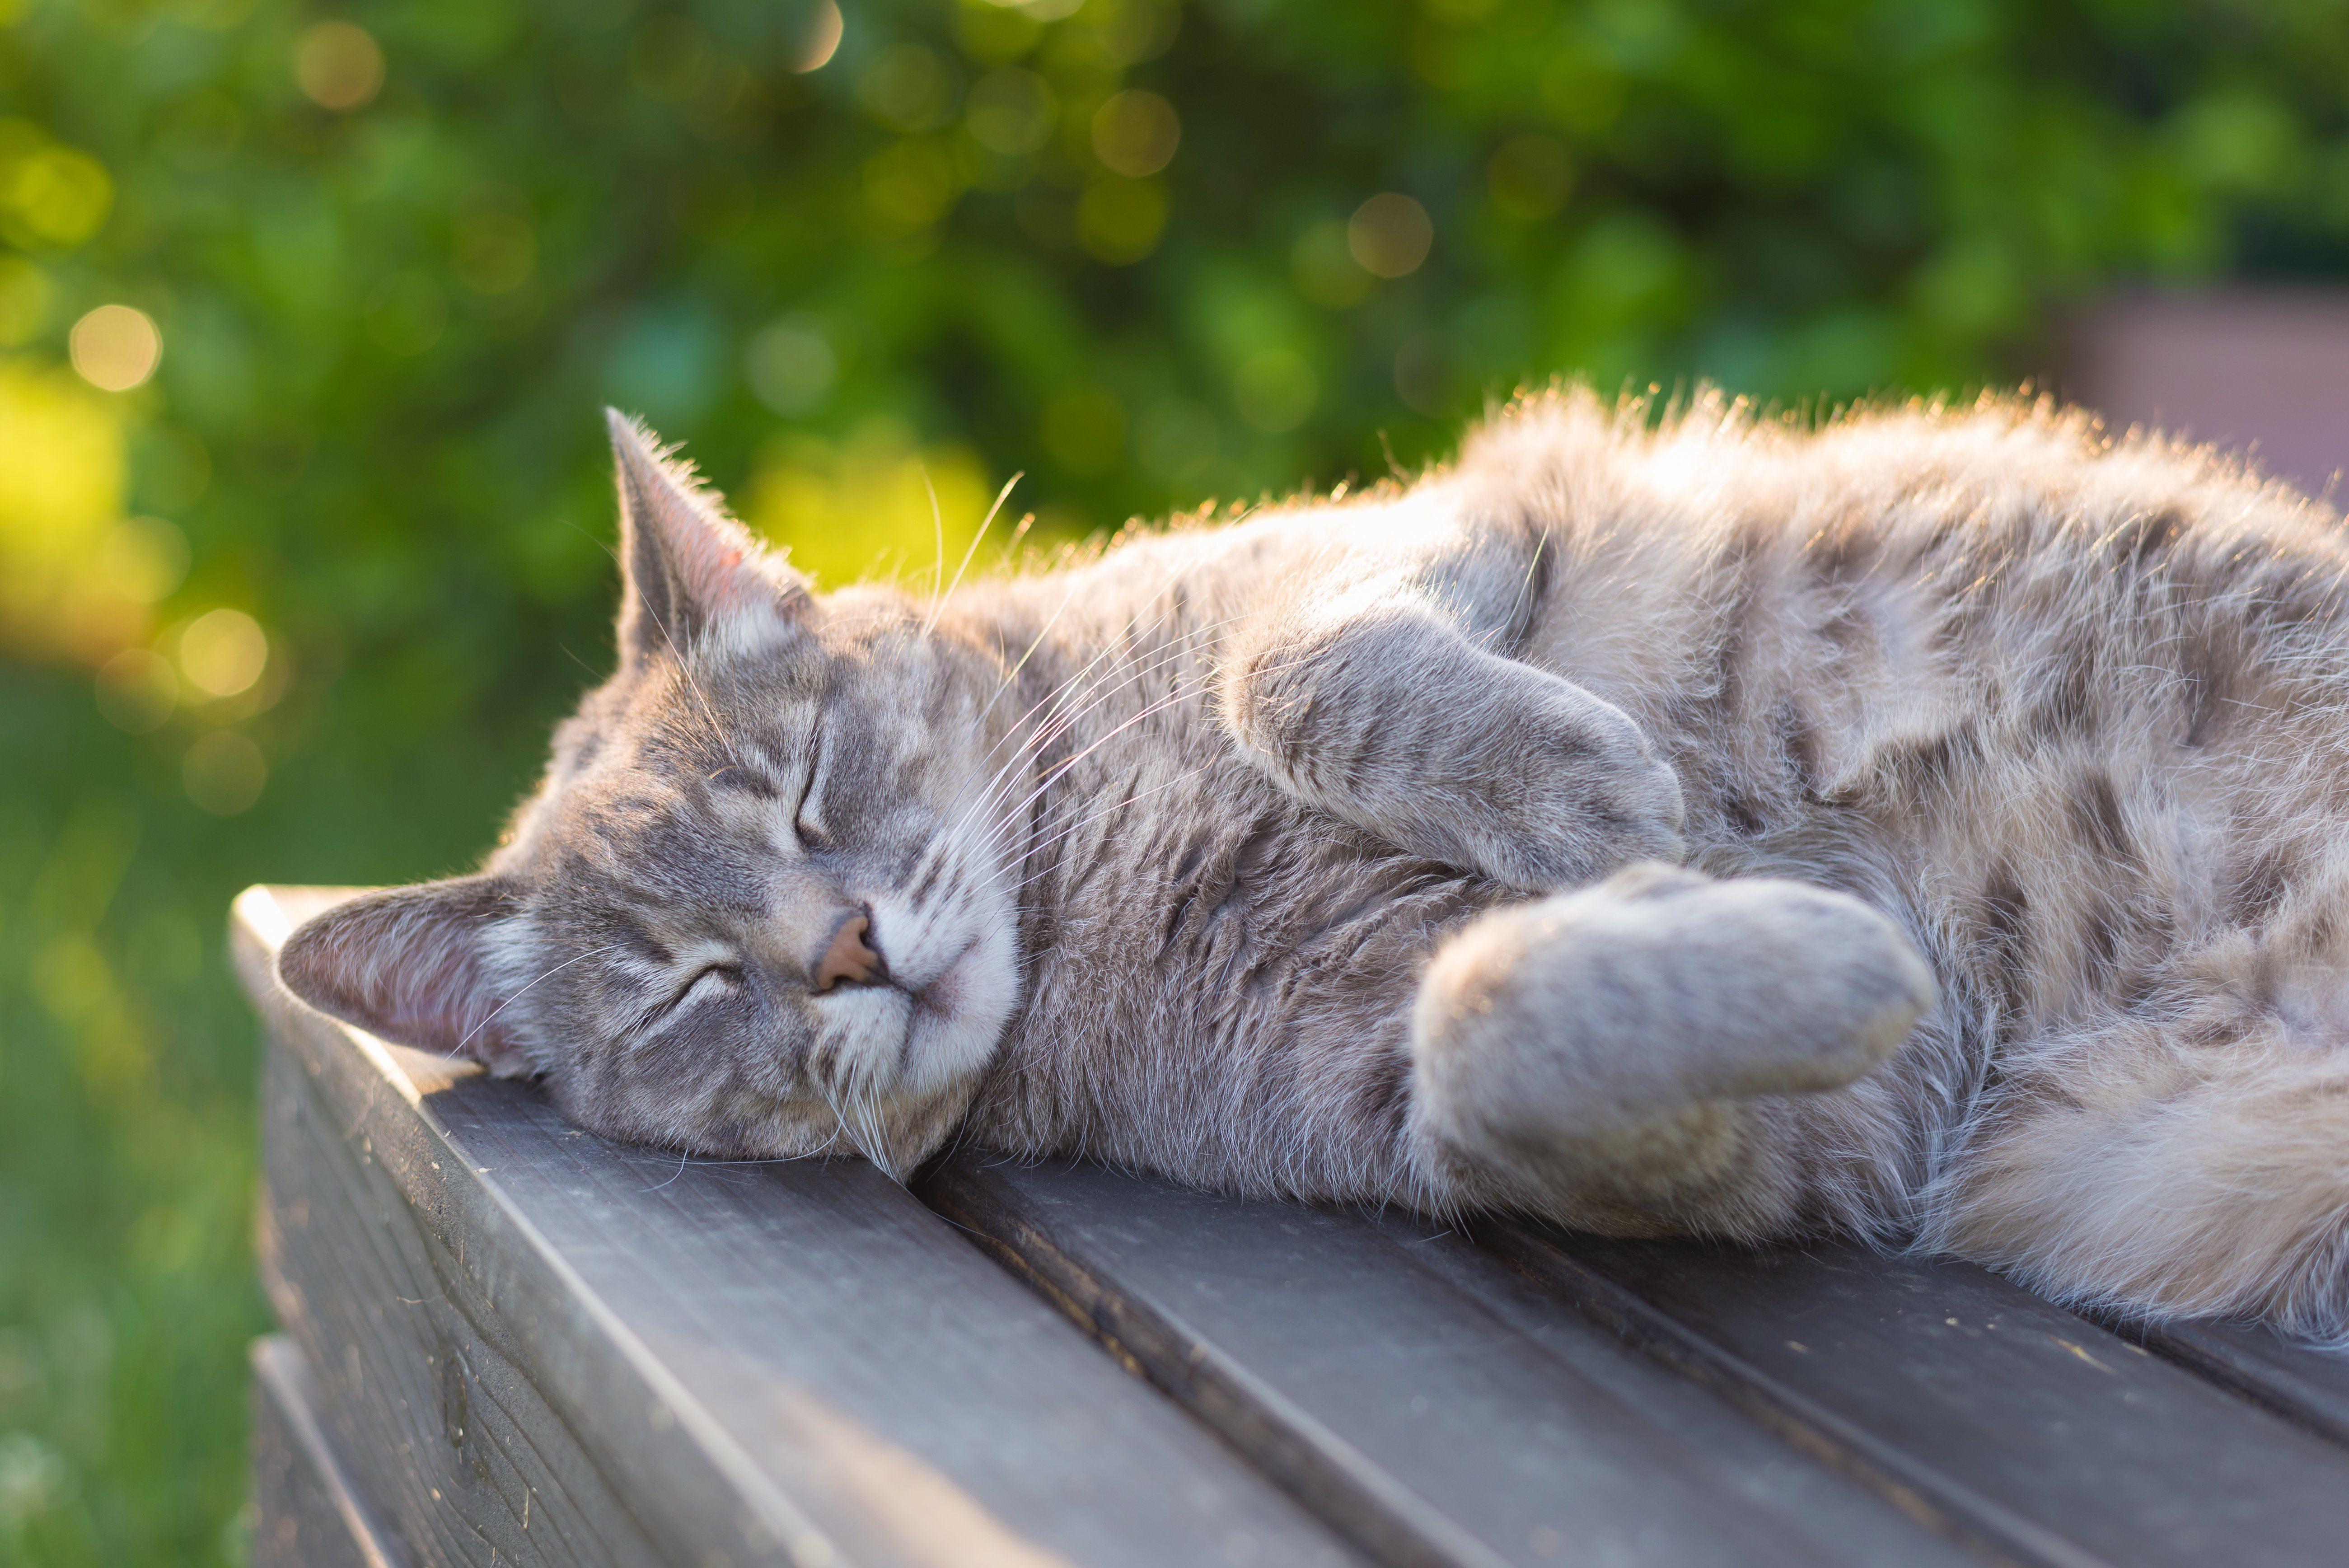 cat sleeping in the sun